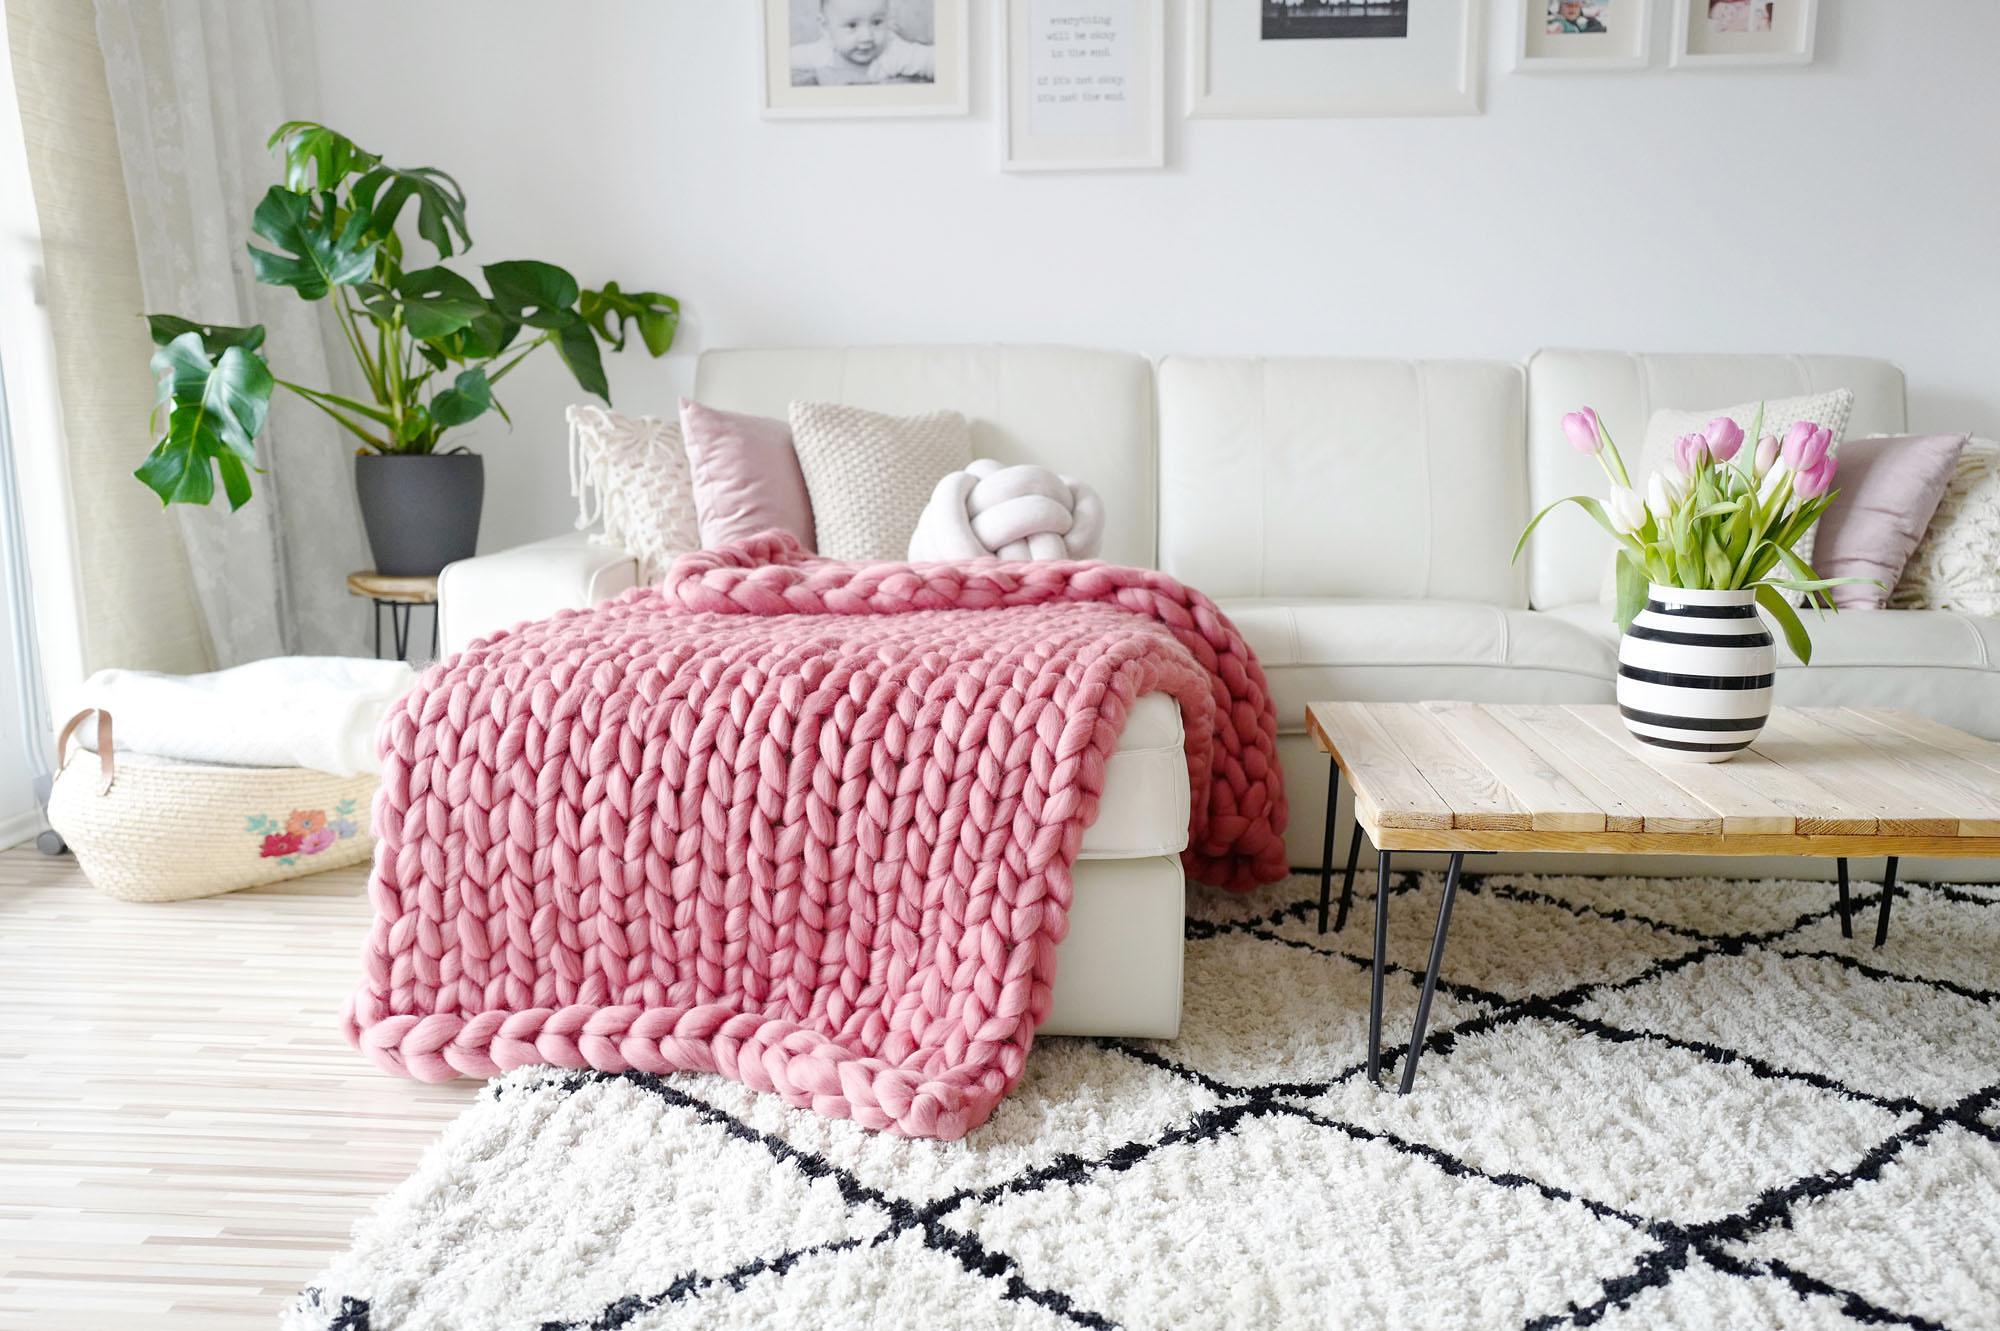 diy chunky knit decke video tutorial mamigurumi. Black Bedroom Furniture Sets. Home Design Ideas